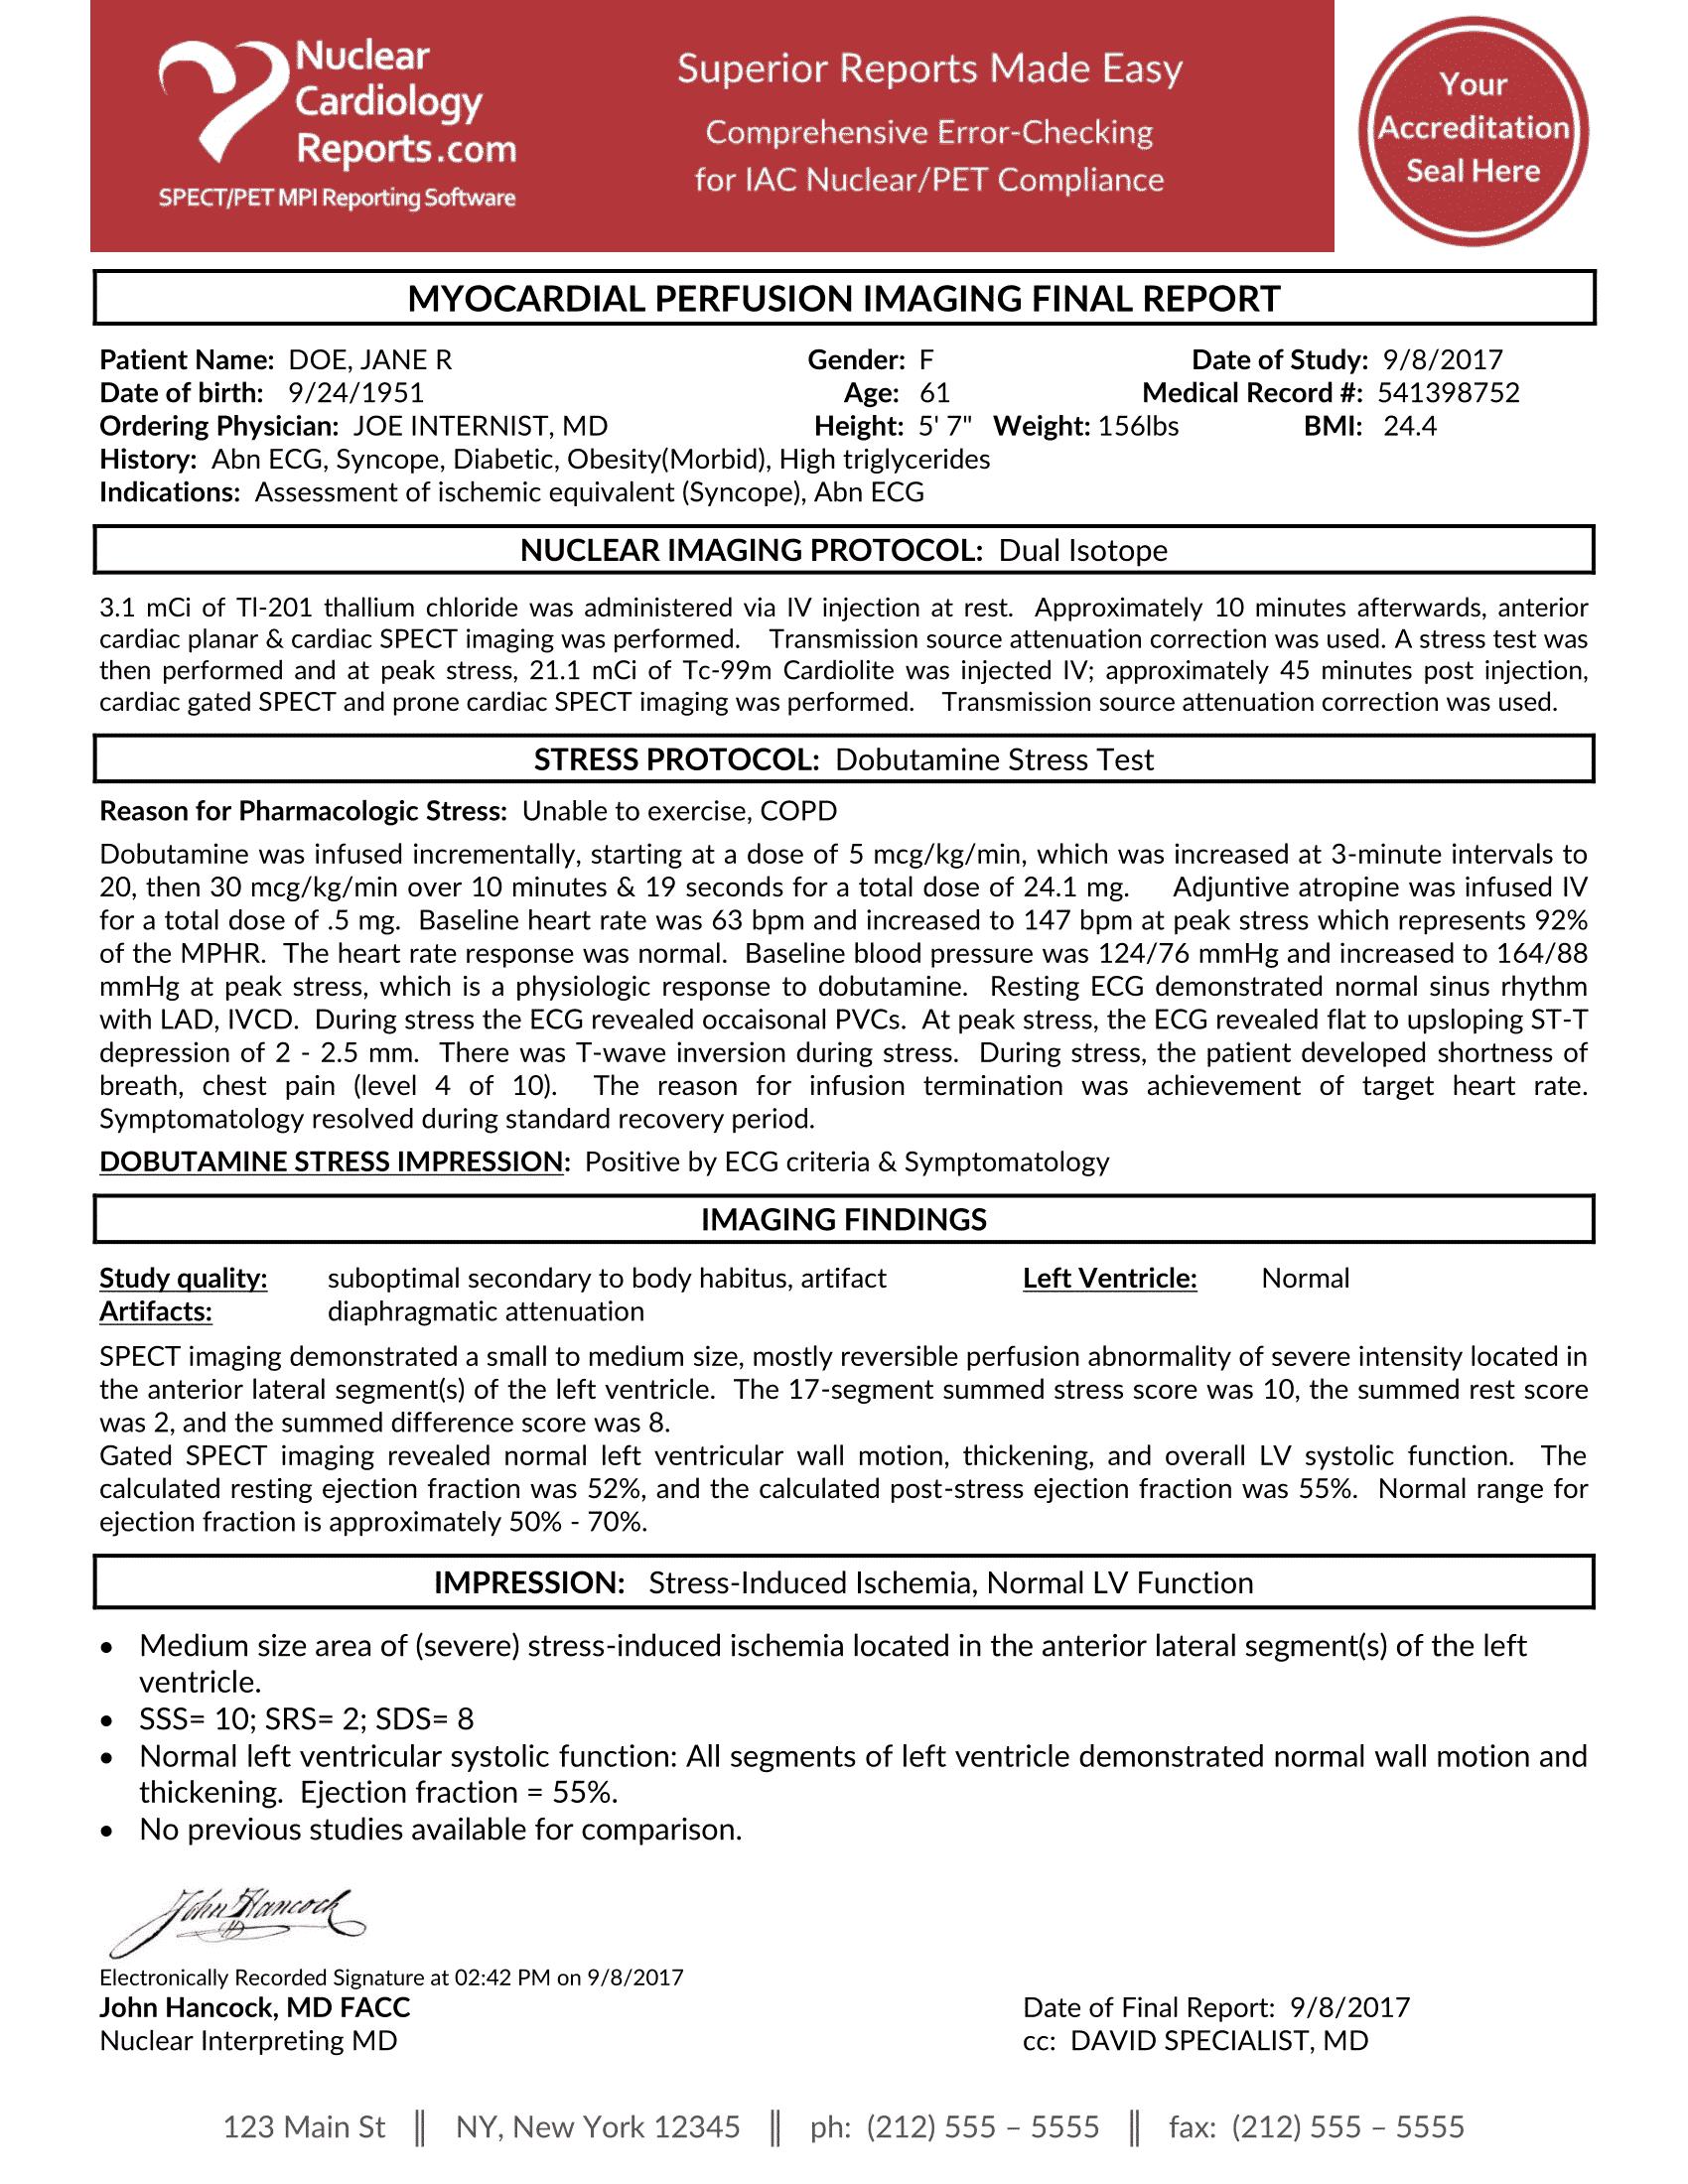 Dobutamine Dual Isotope